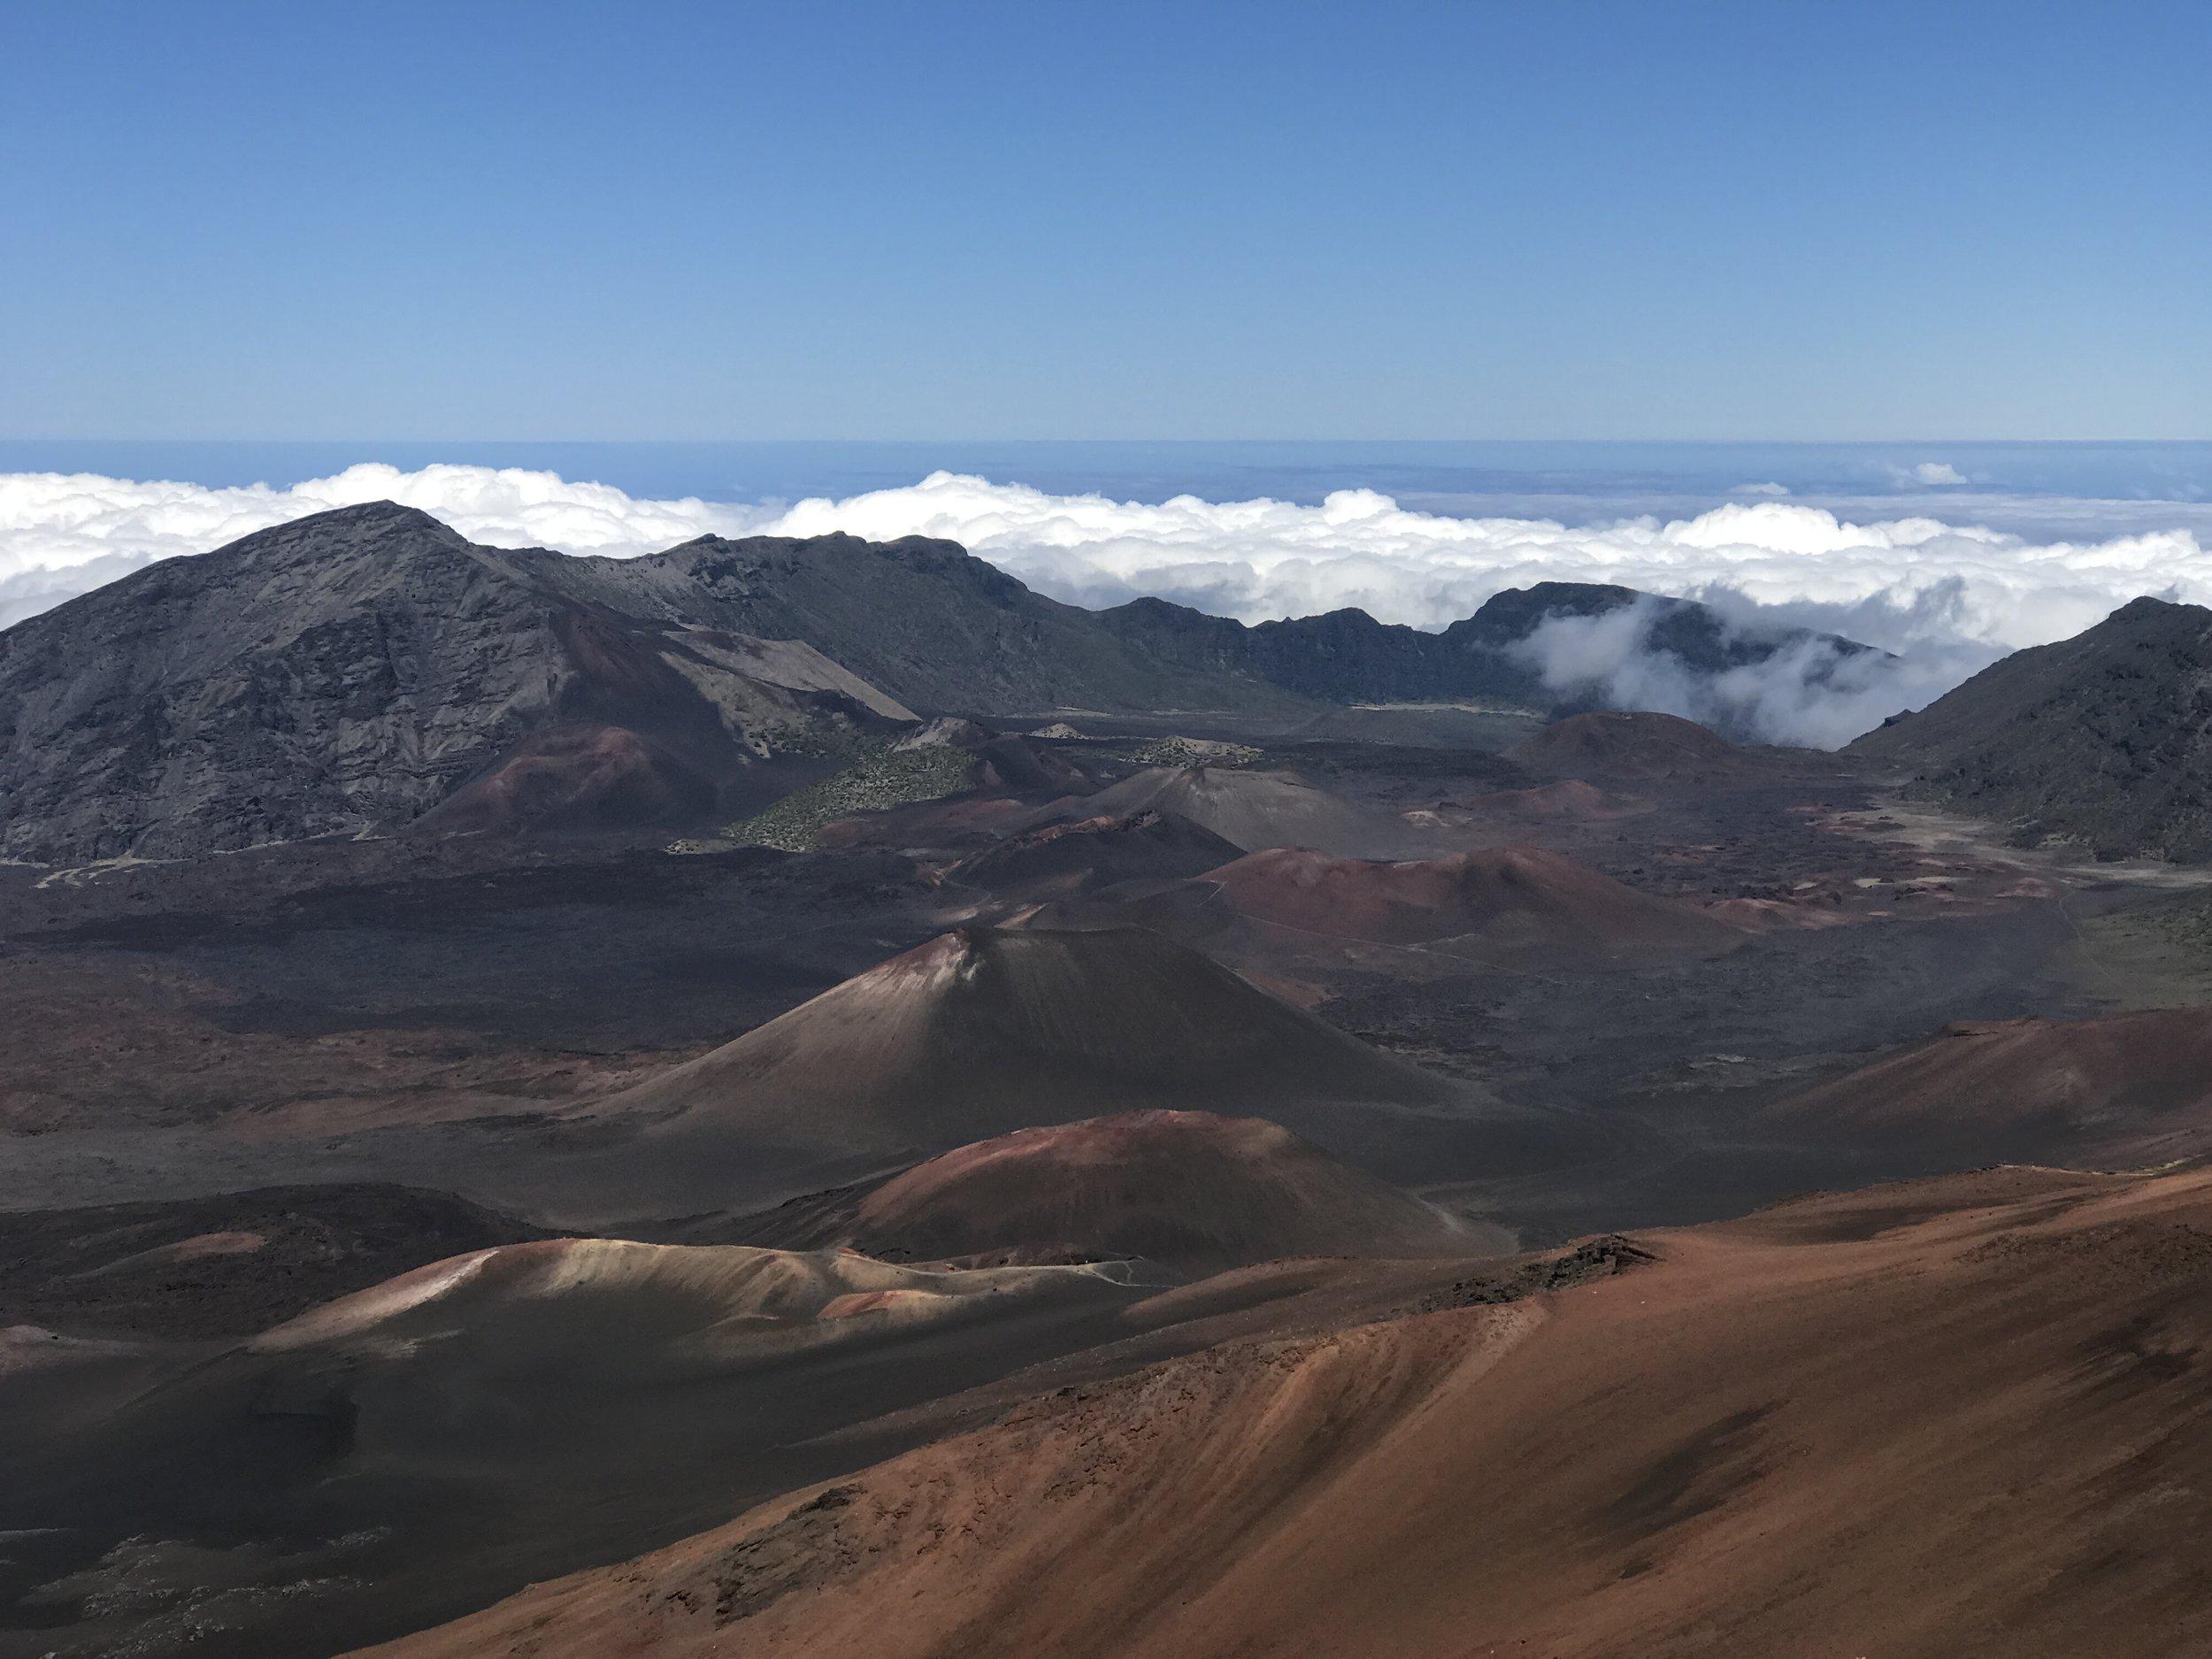 Haleakala Crater / warporweft.com